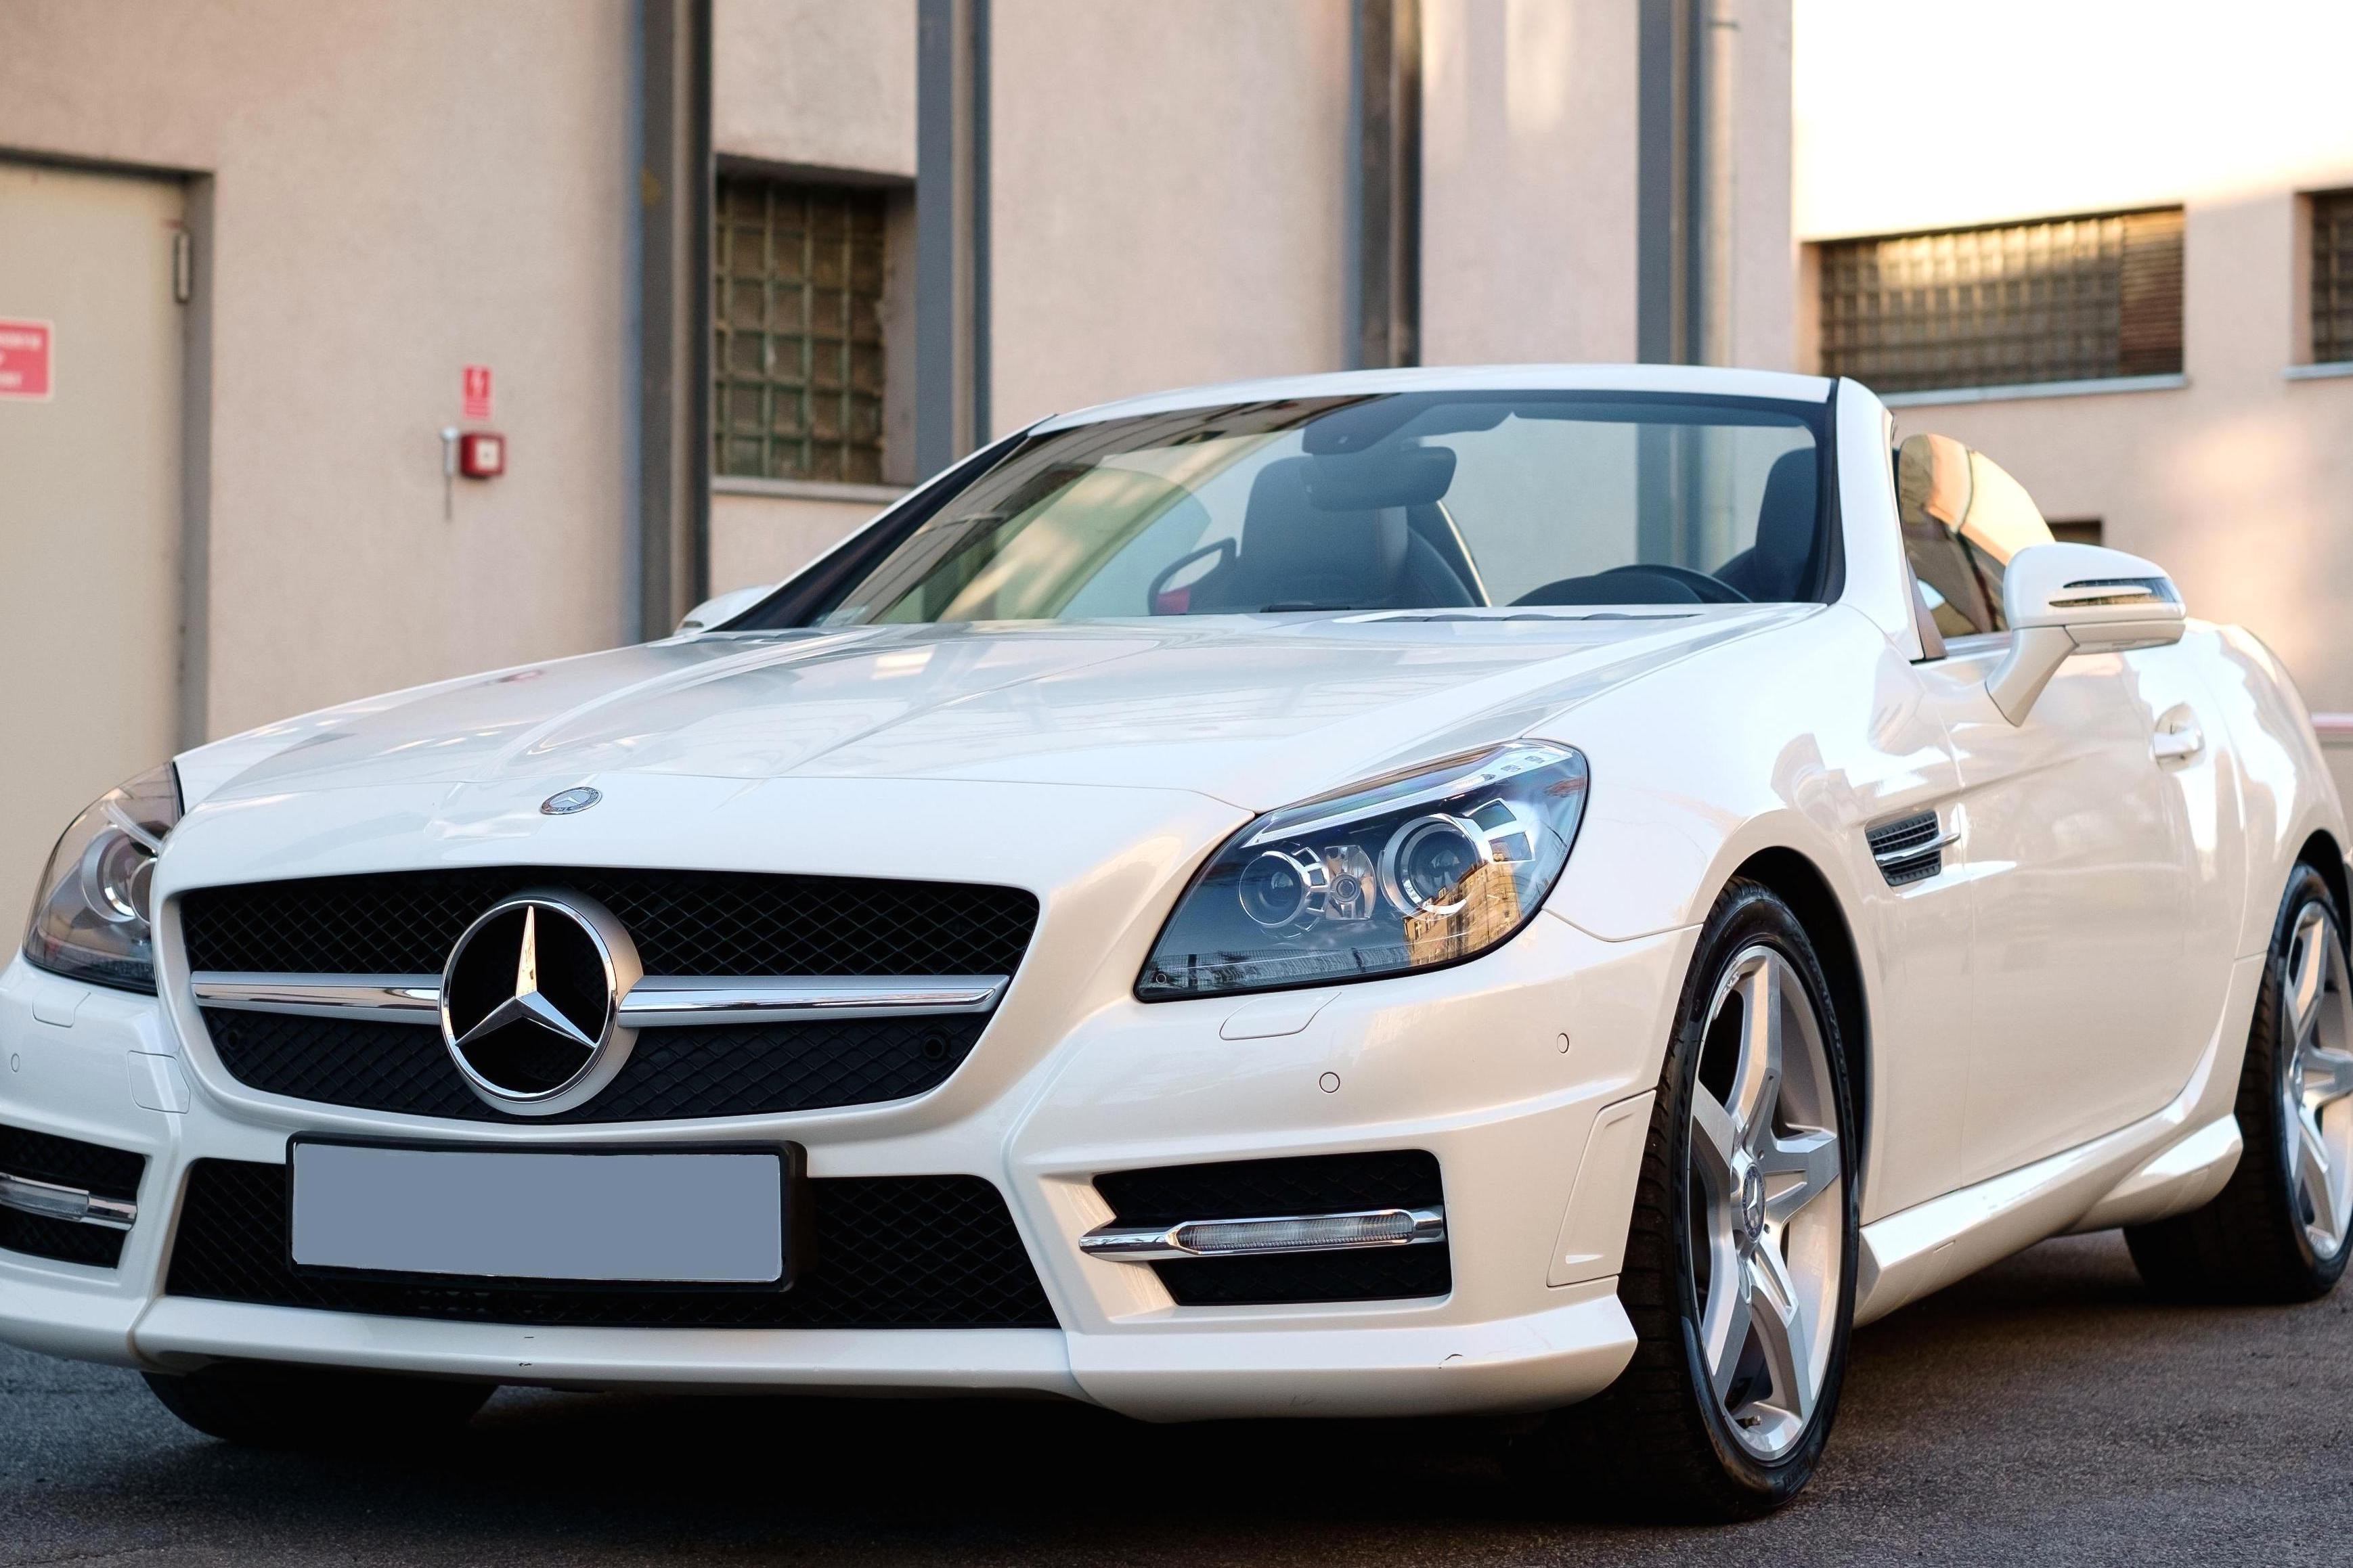 Free picture: car, dashboard, interior, modern, vehicle, speedometer